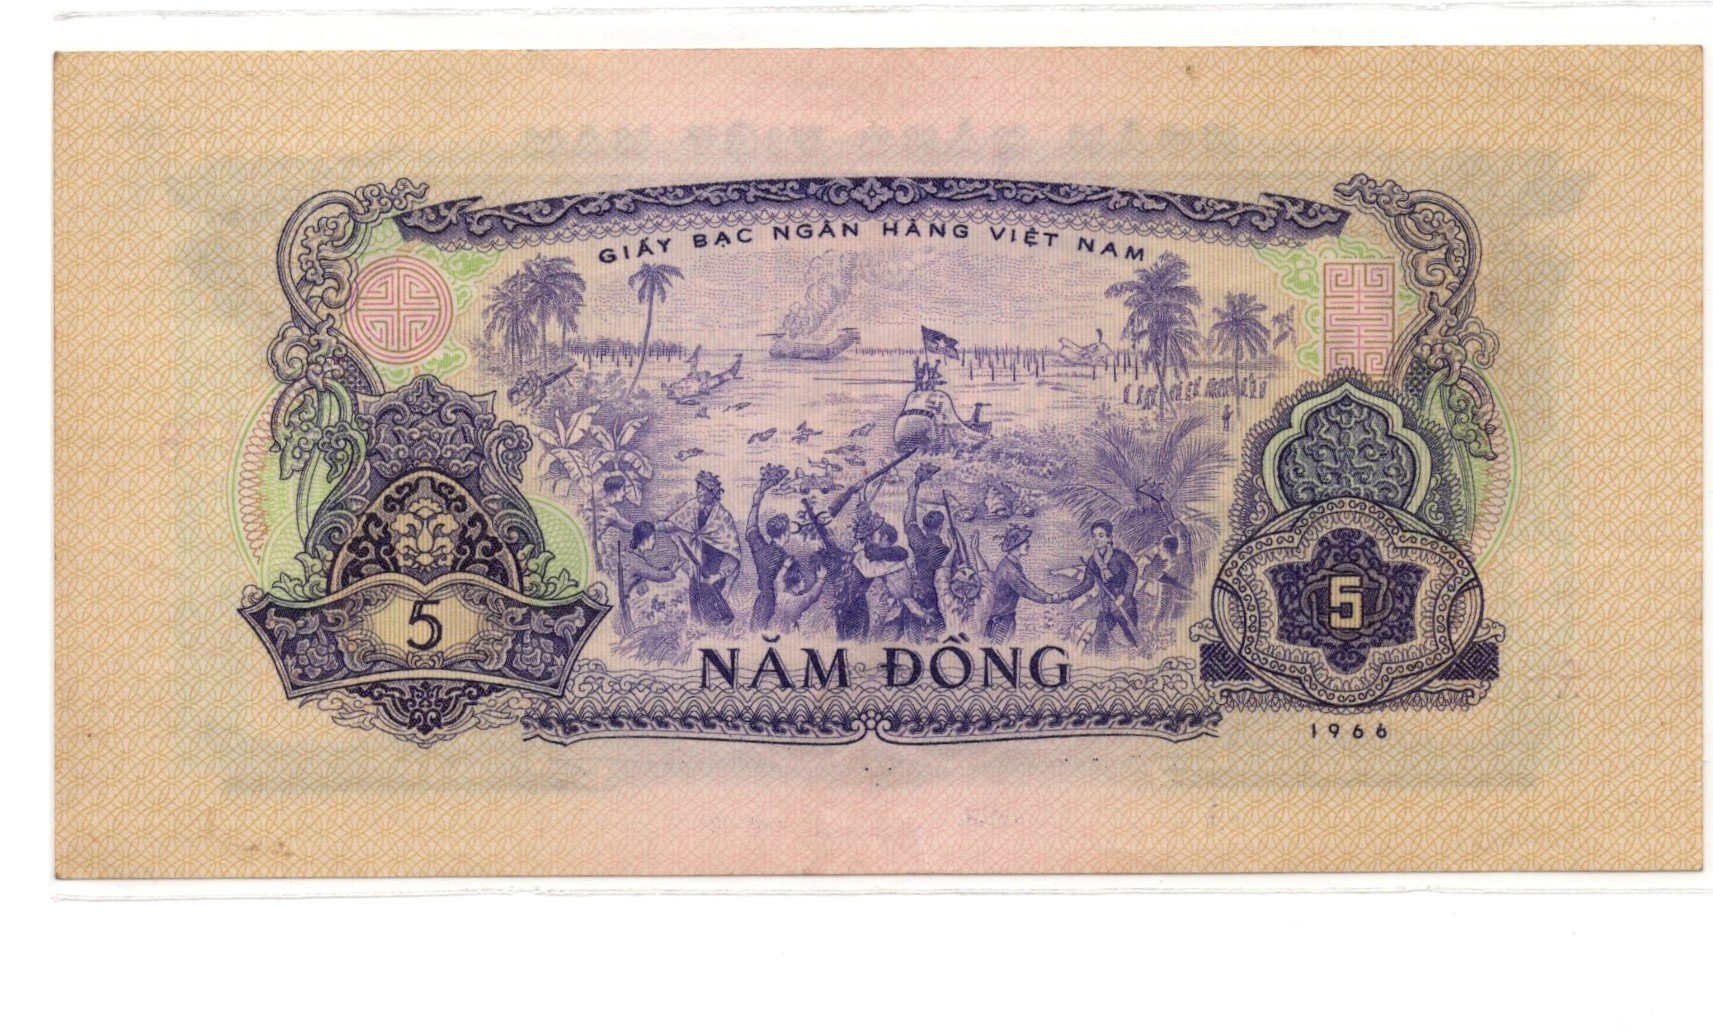 south vietnam  5 dong 1966 banknote